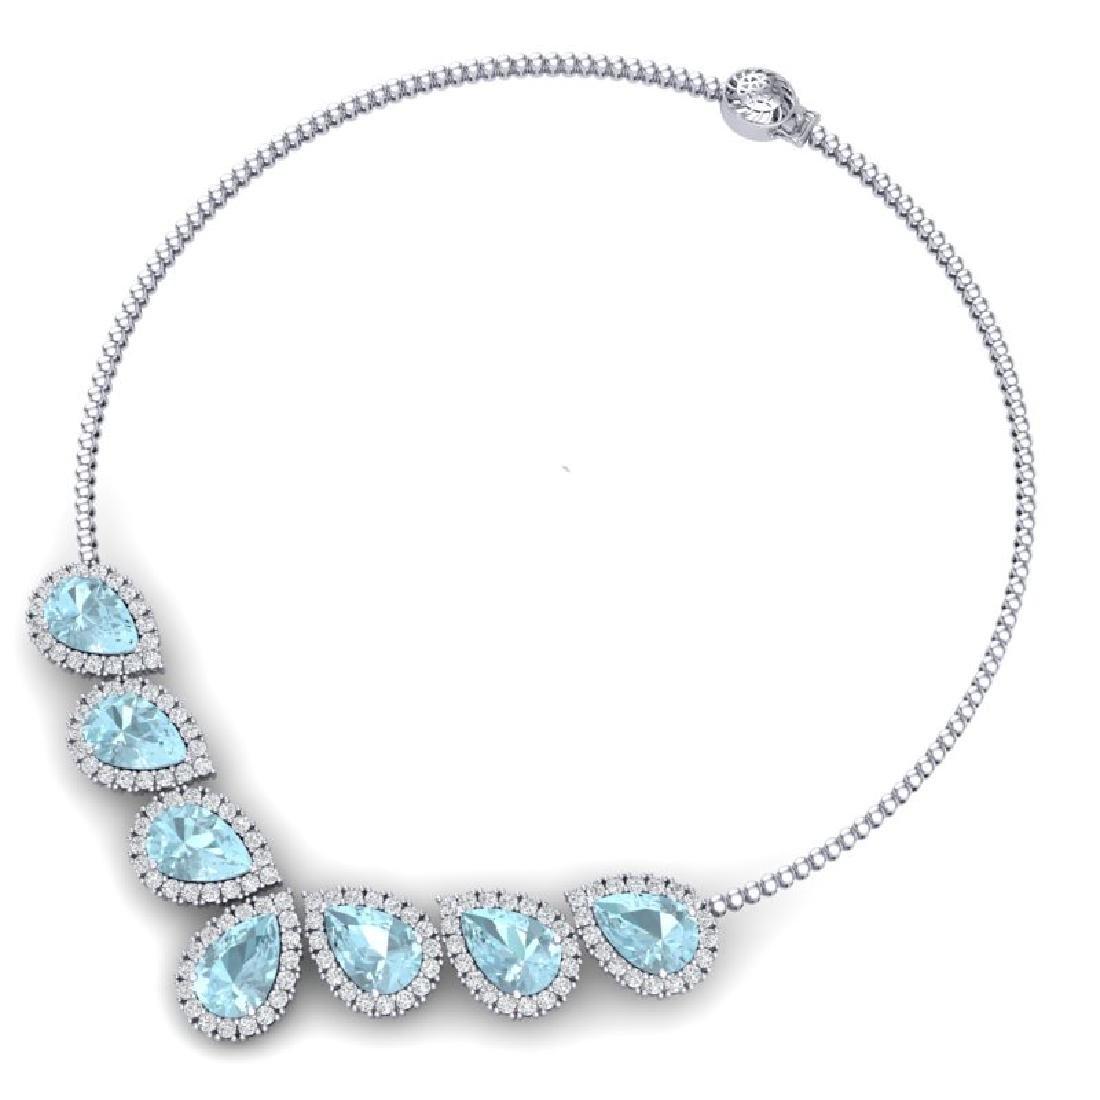 36.24 CTW Royalty Sky Topaz & VS Diamond Necklace 18K - 3